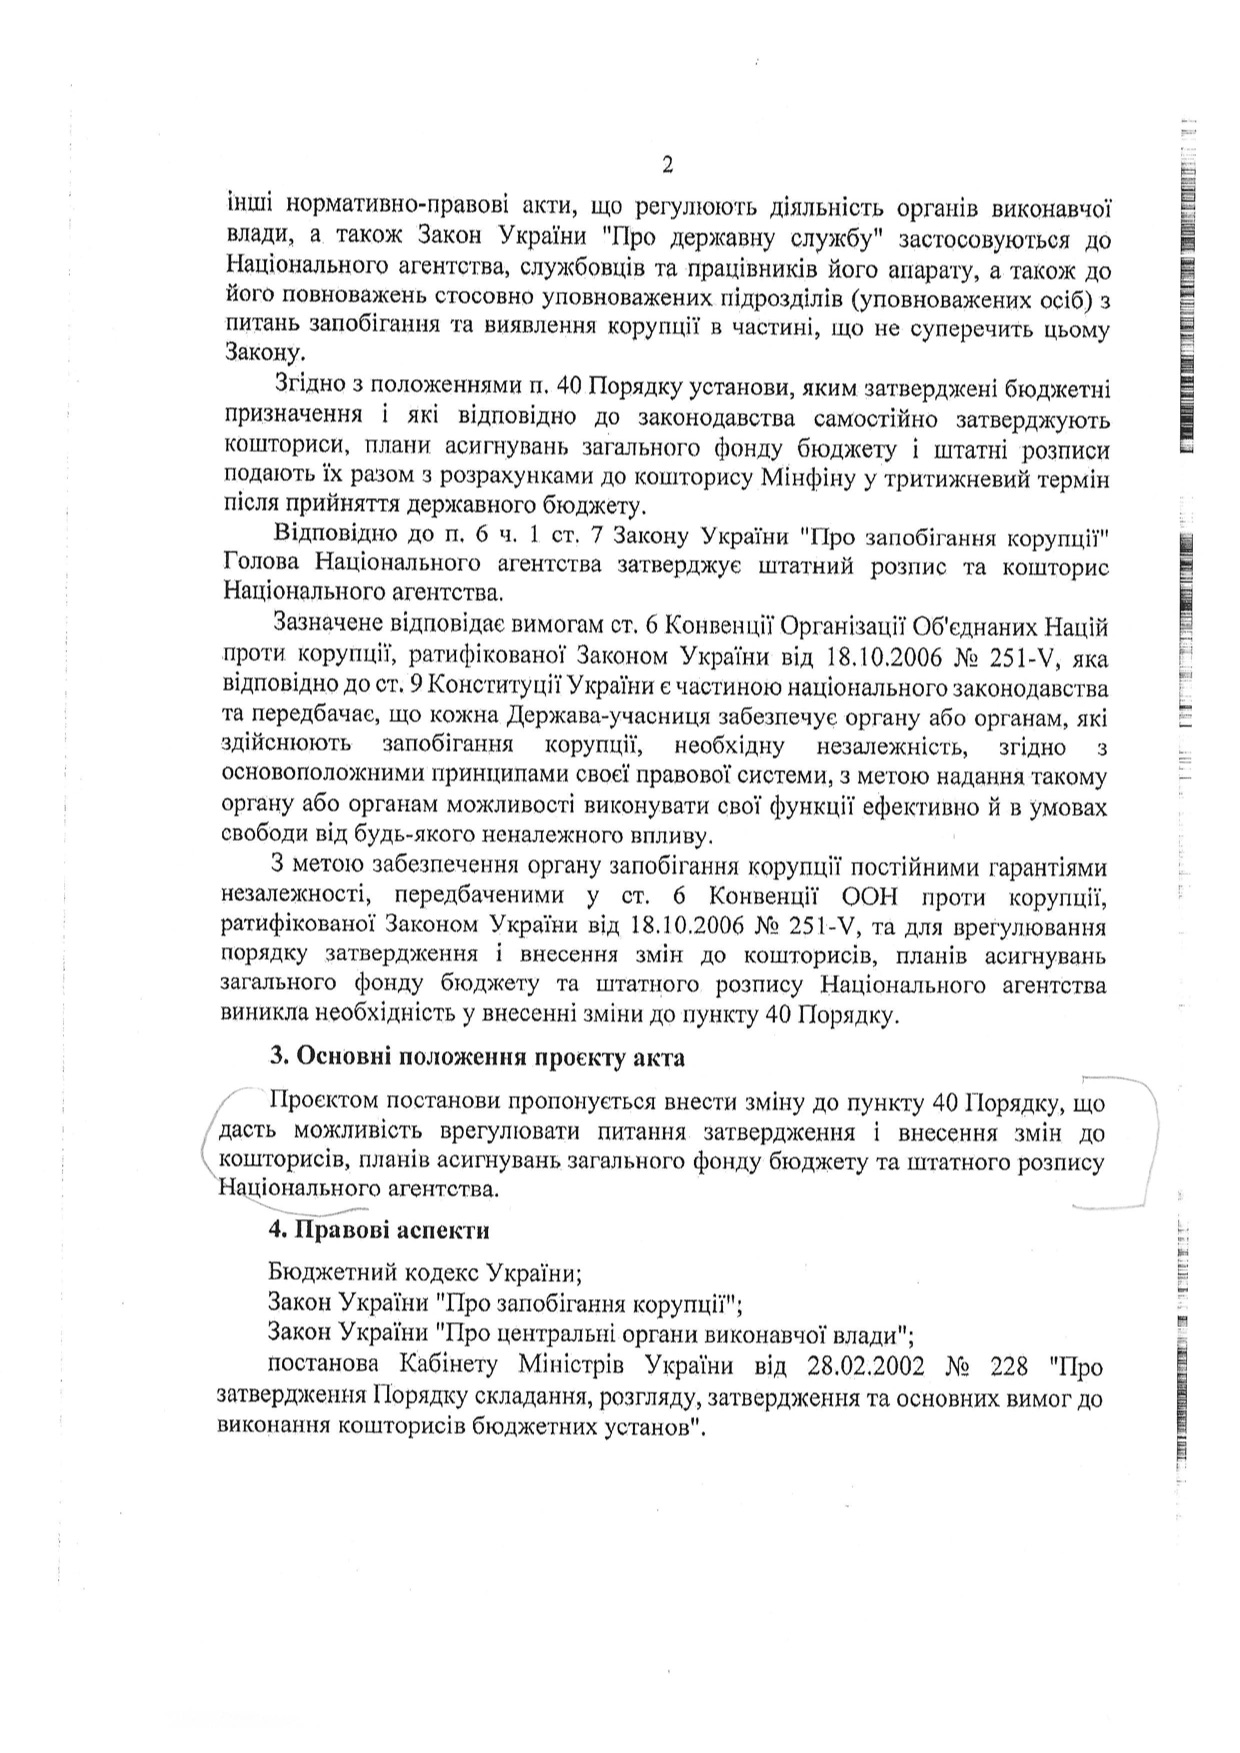 yurchhscan2